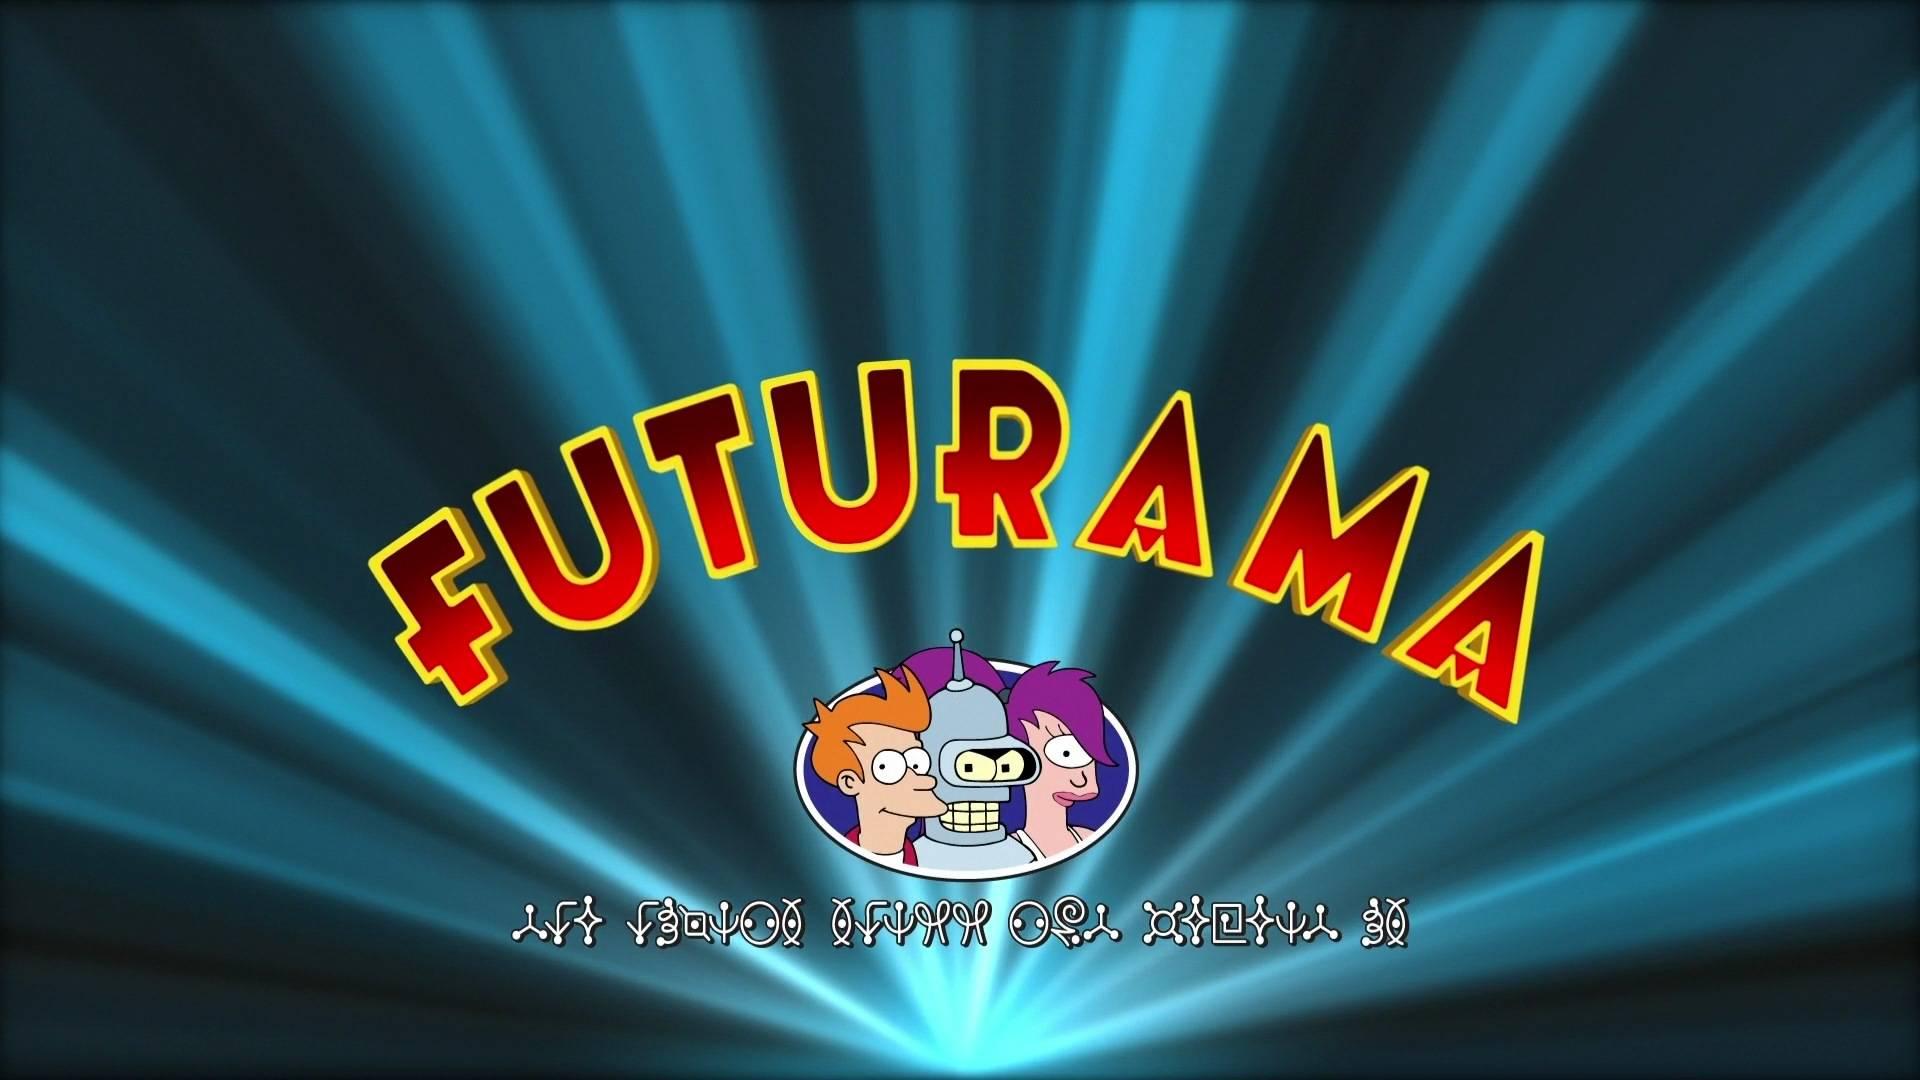 Futurama wallpapers wallpapersafari - Futurama wallpaper ...